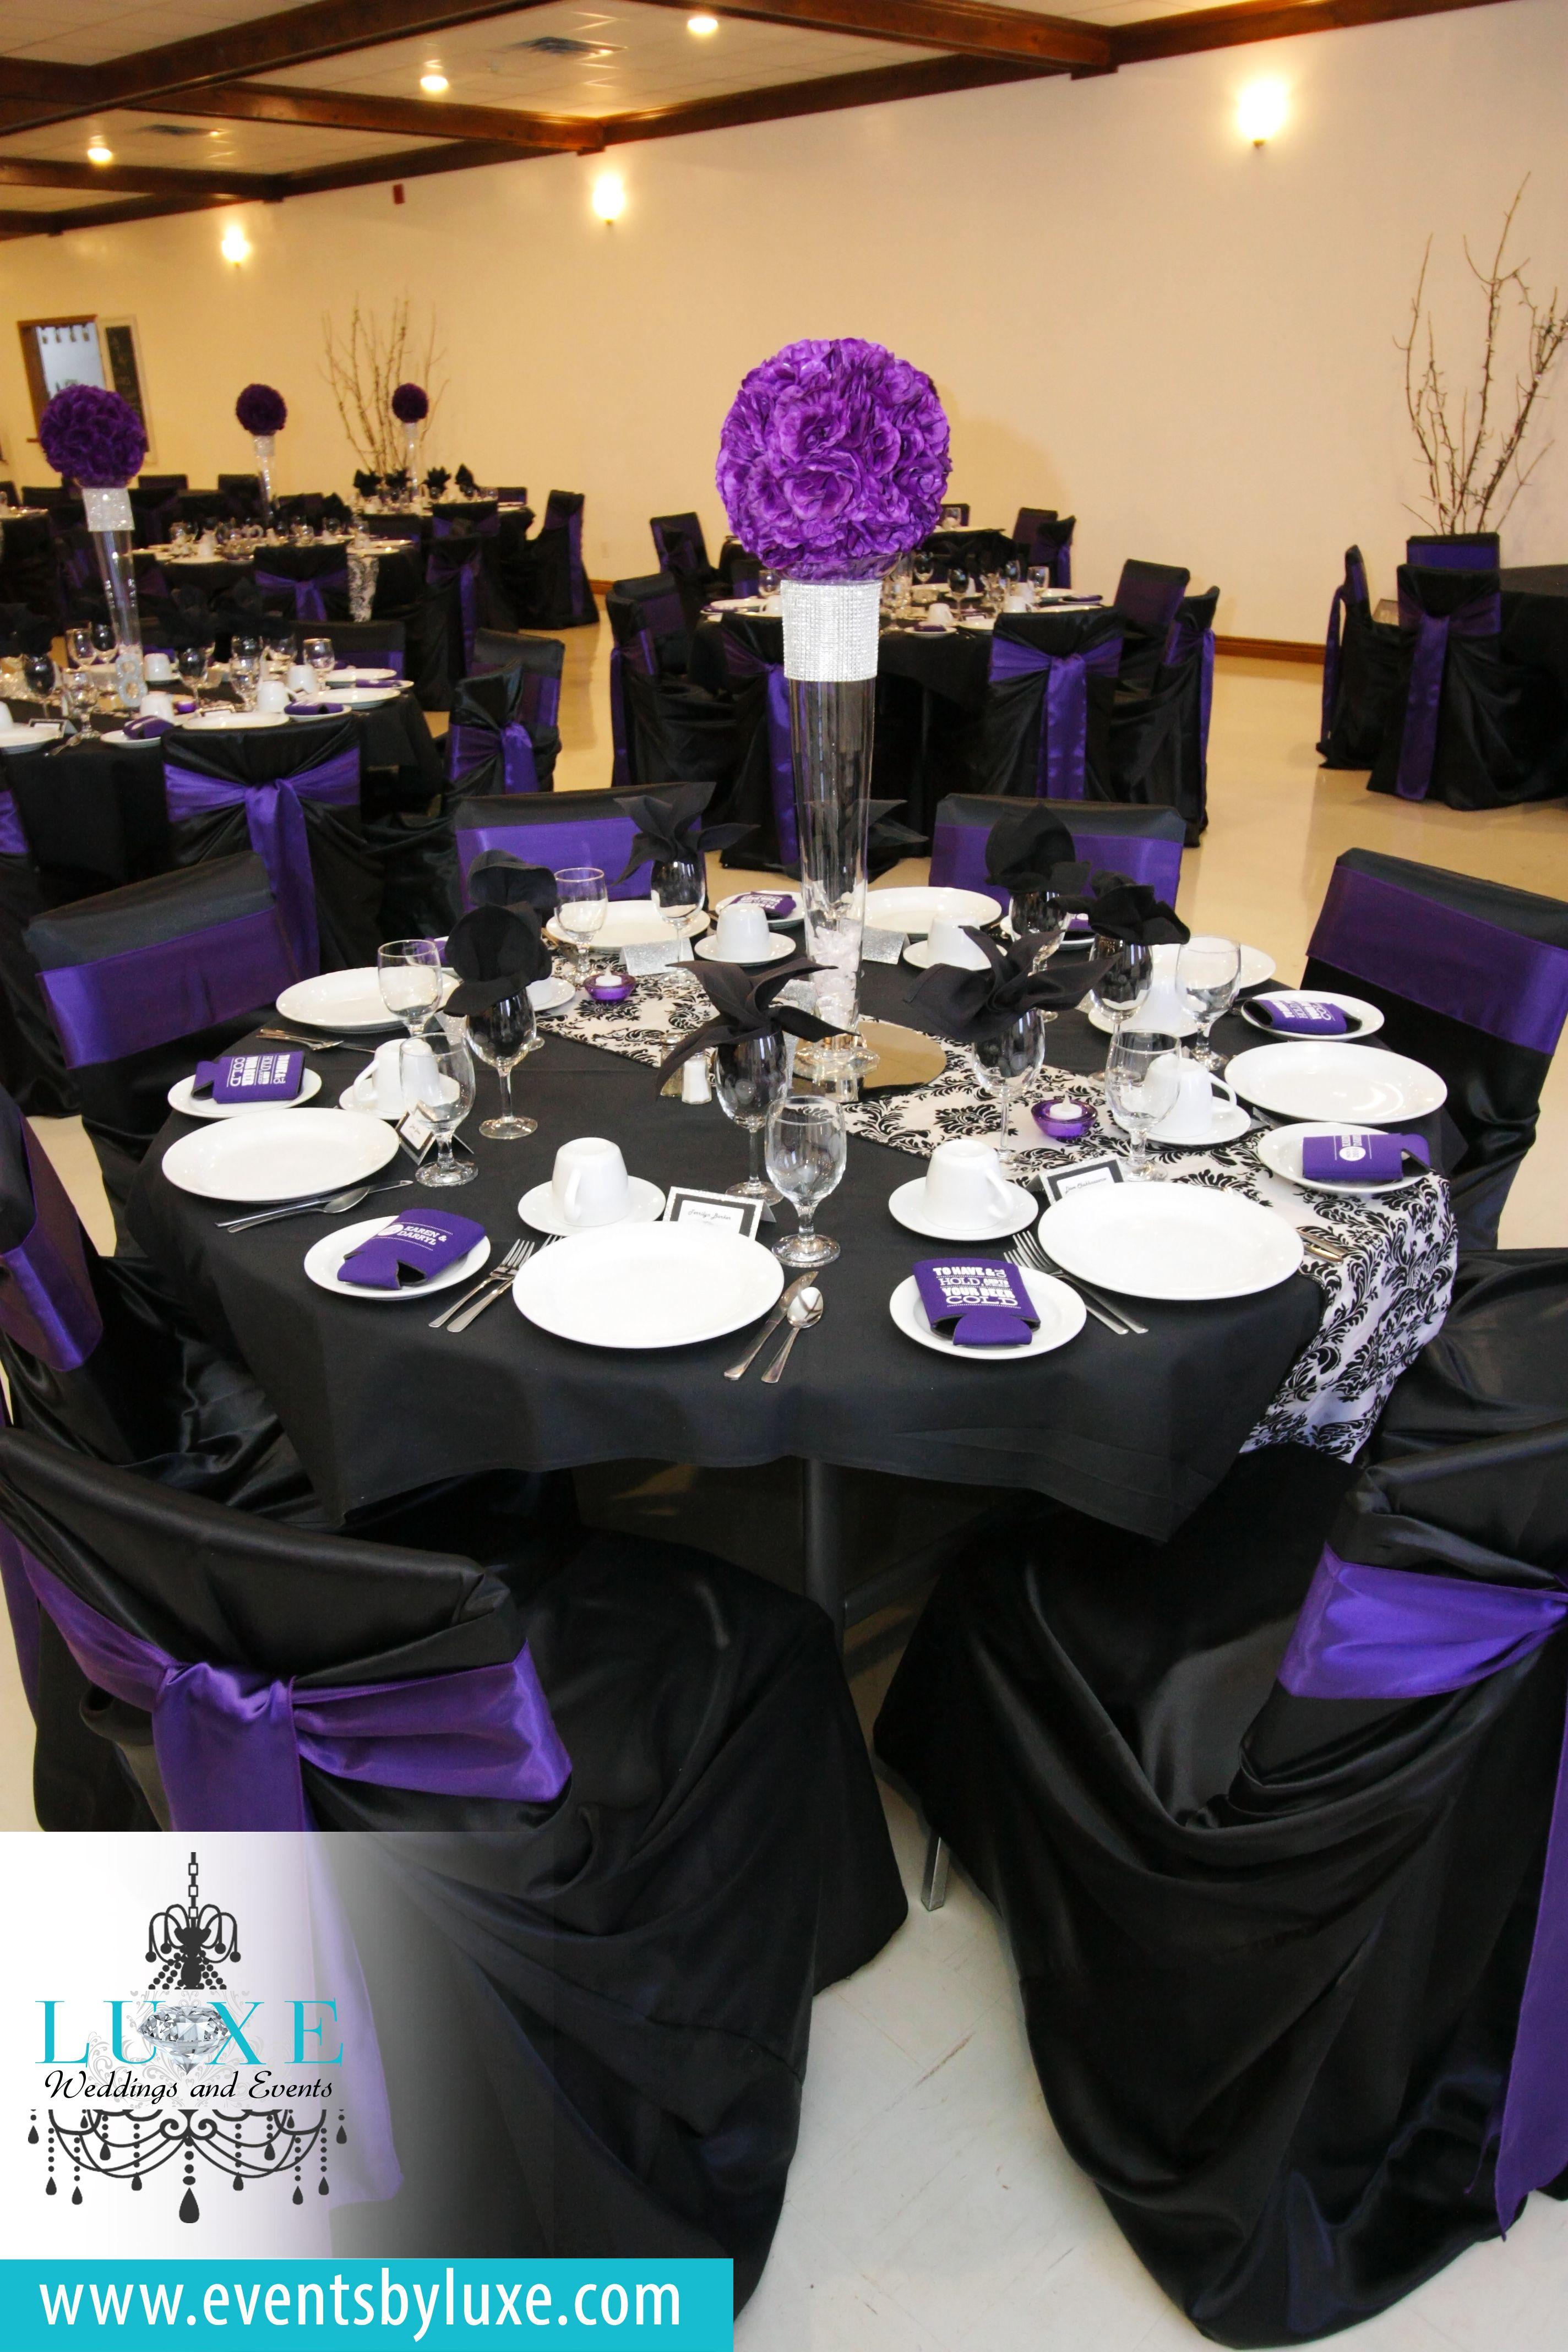 Wedding chairs black and white - Purple Black And White Damask Wedding Decor Damask Wedding Decor Purple